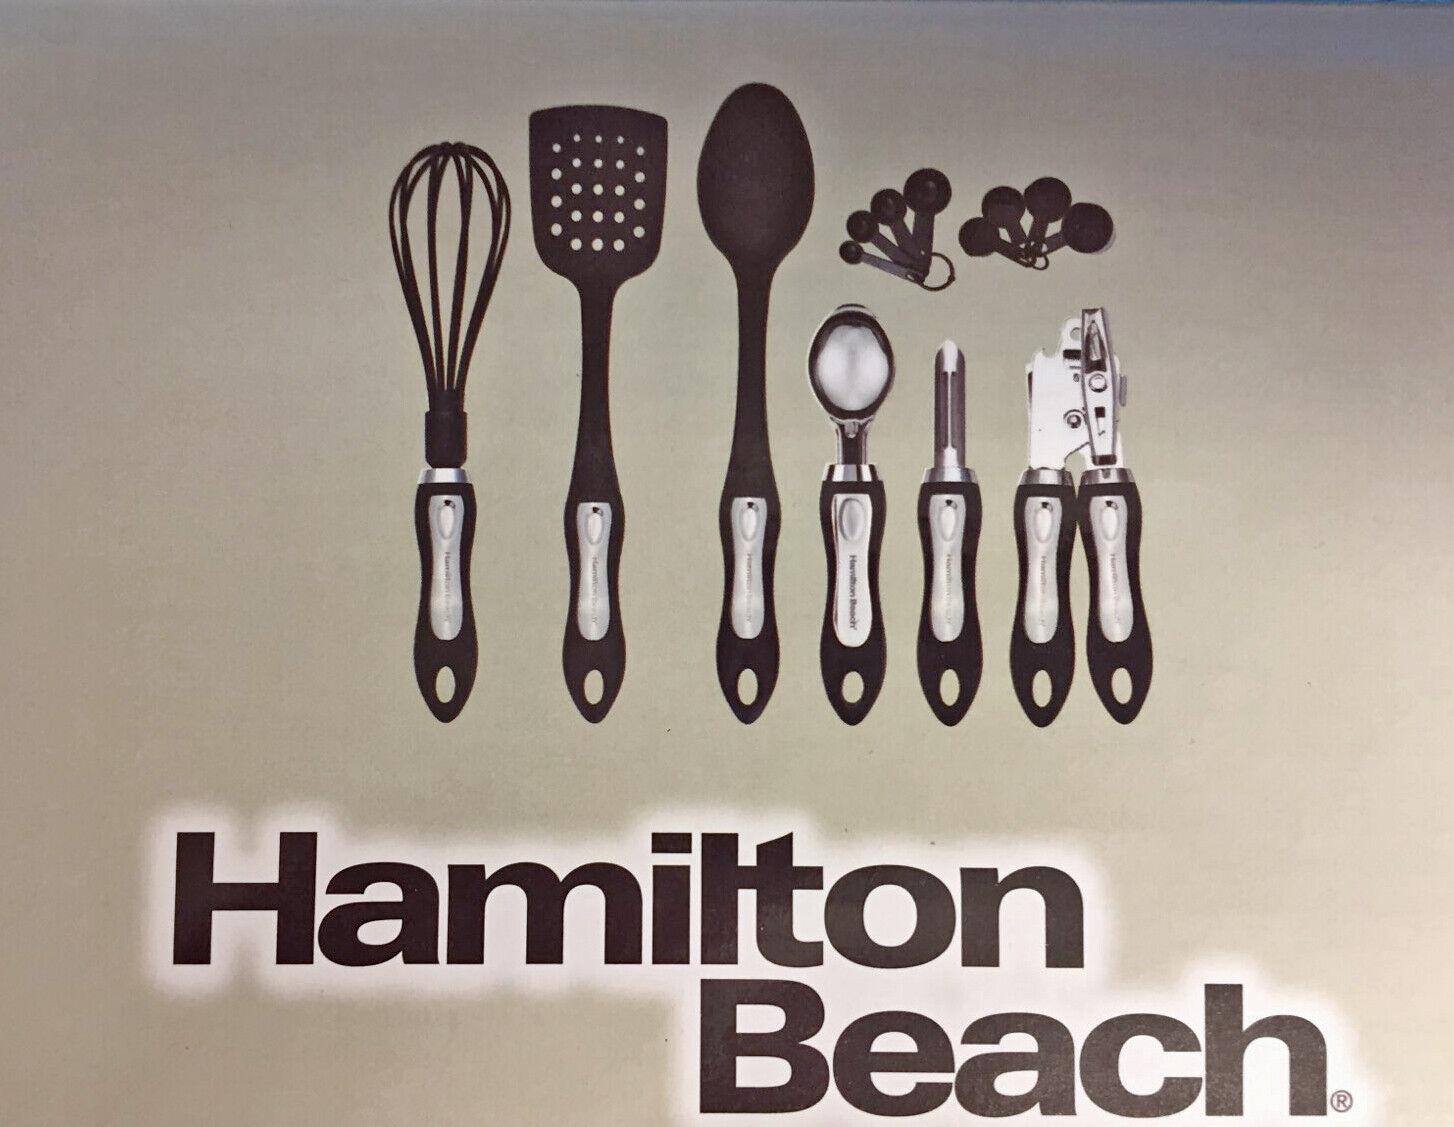 Black Hamilton Beach Kitchen 6 Piece Soft Touch Handle Cooking Utensil Set